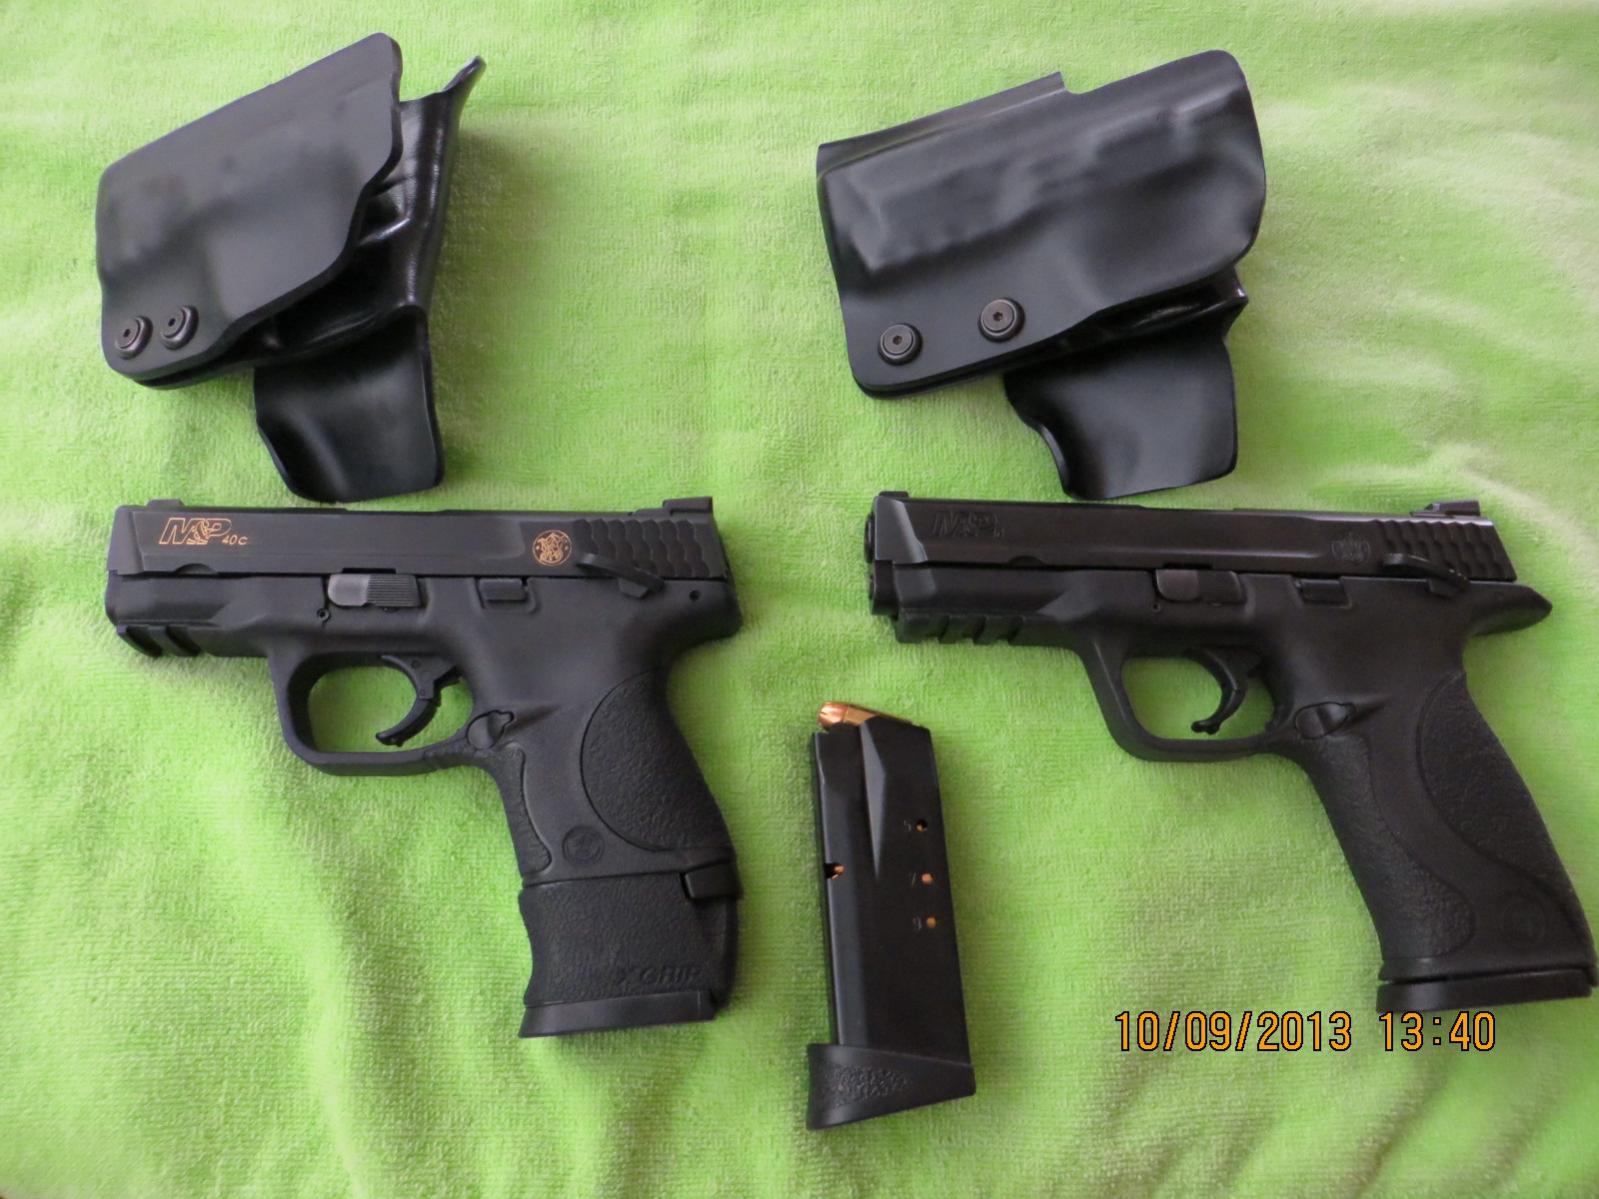 Comfortable OWB SR9c holster - cheap-img_0004-004.jpg